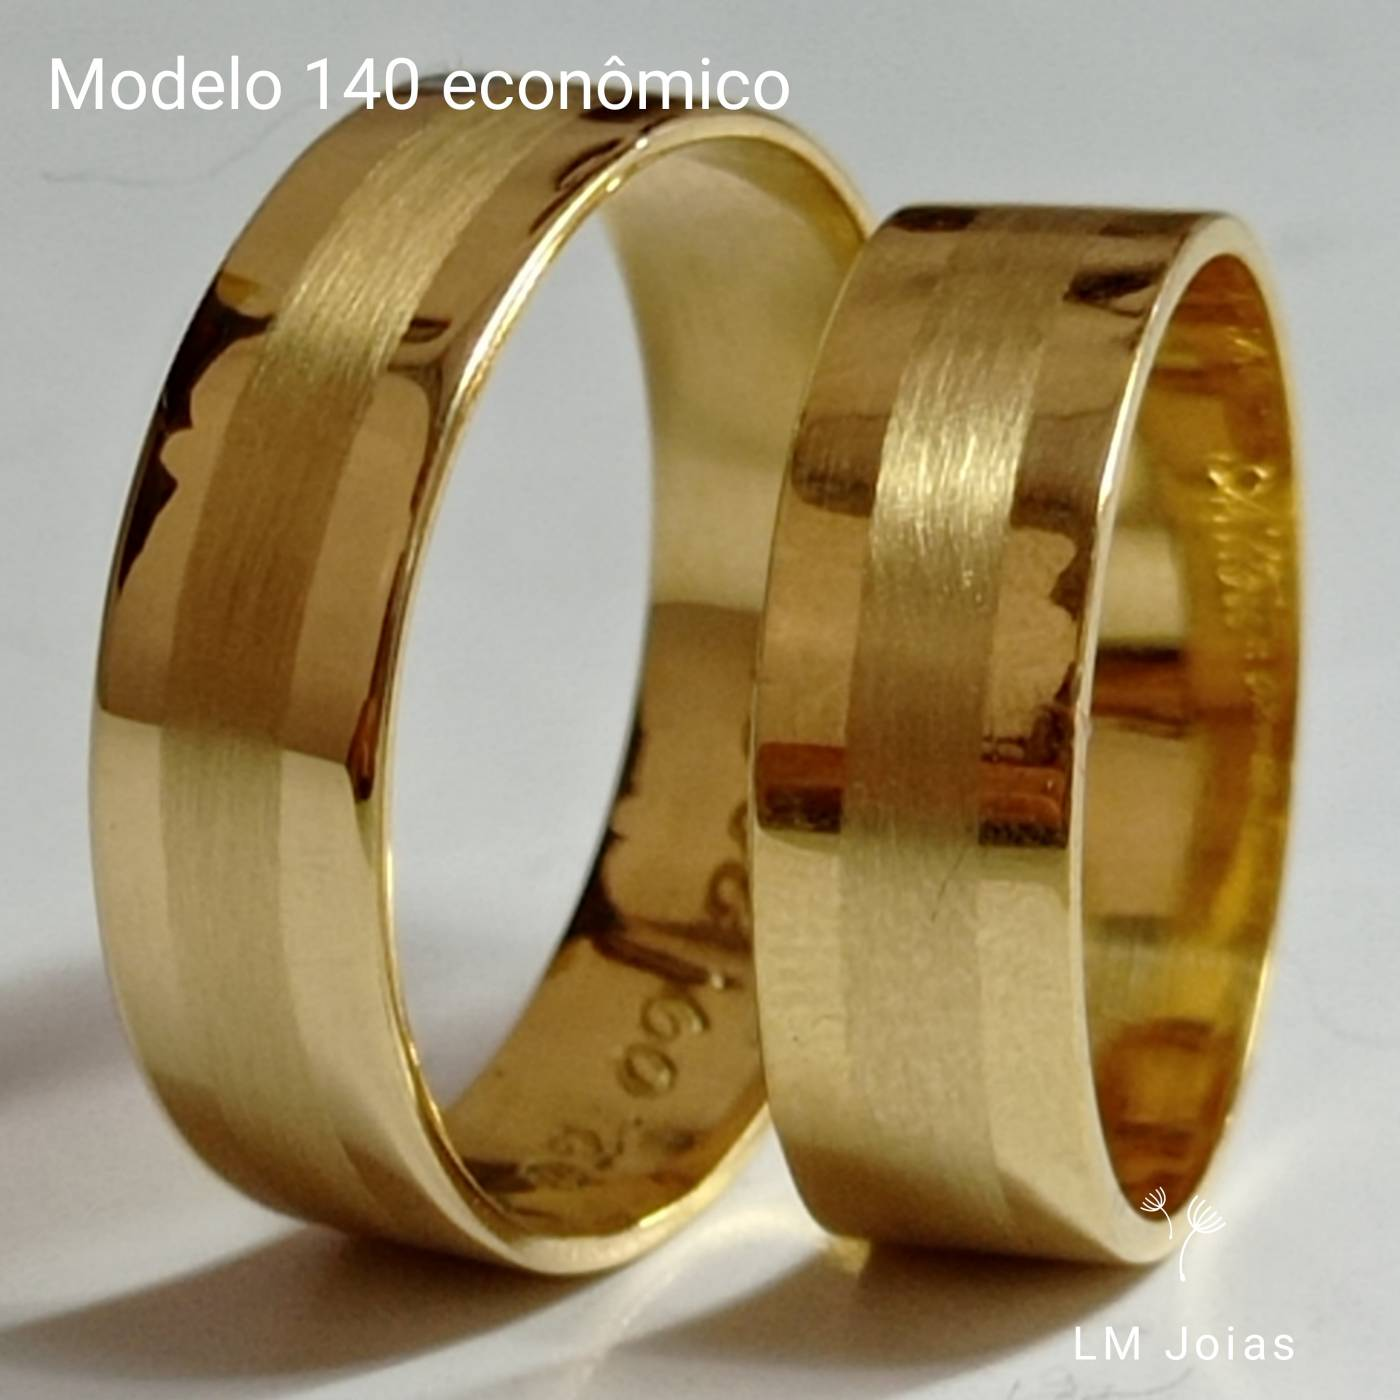 Modelo 140 econômico